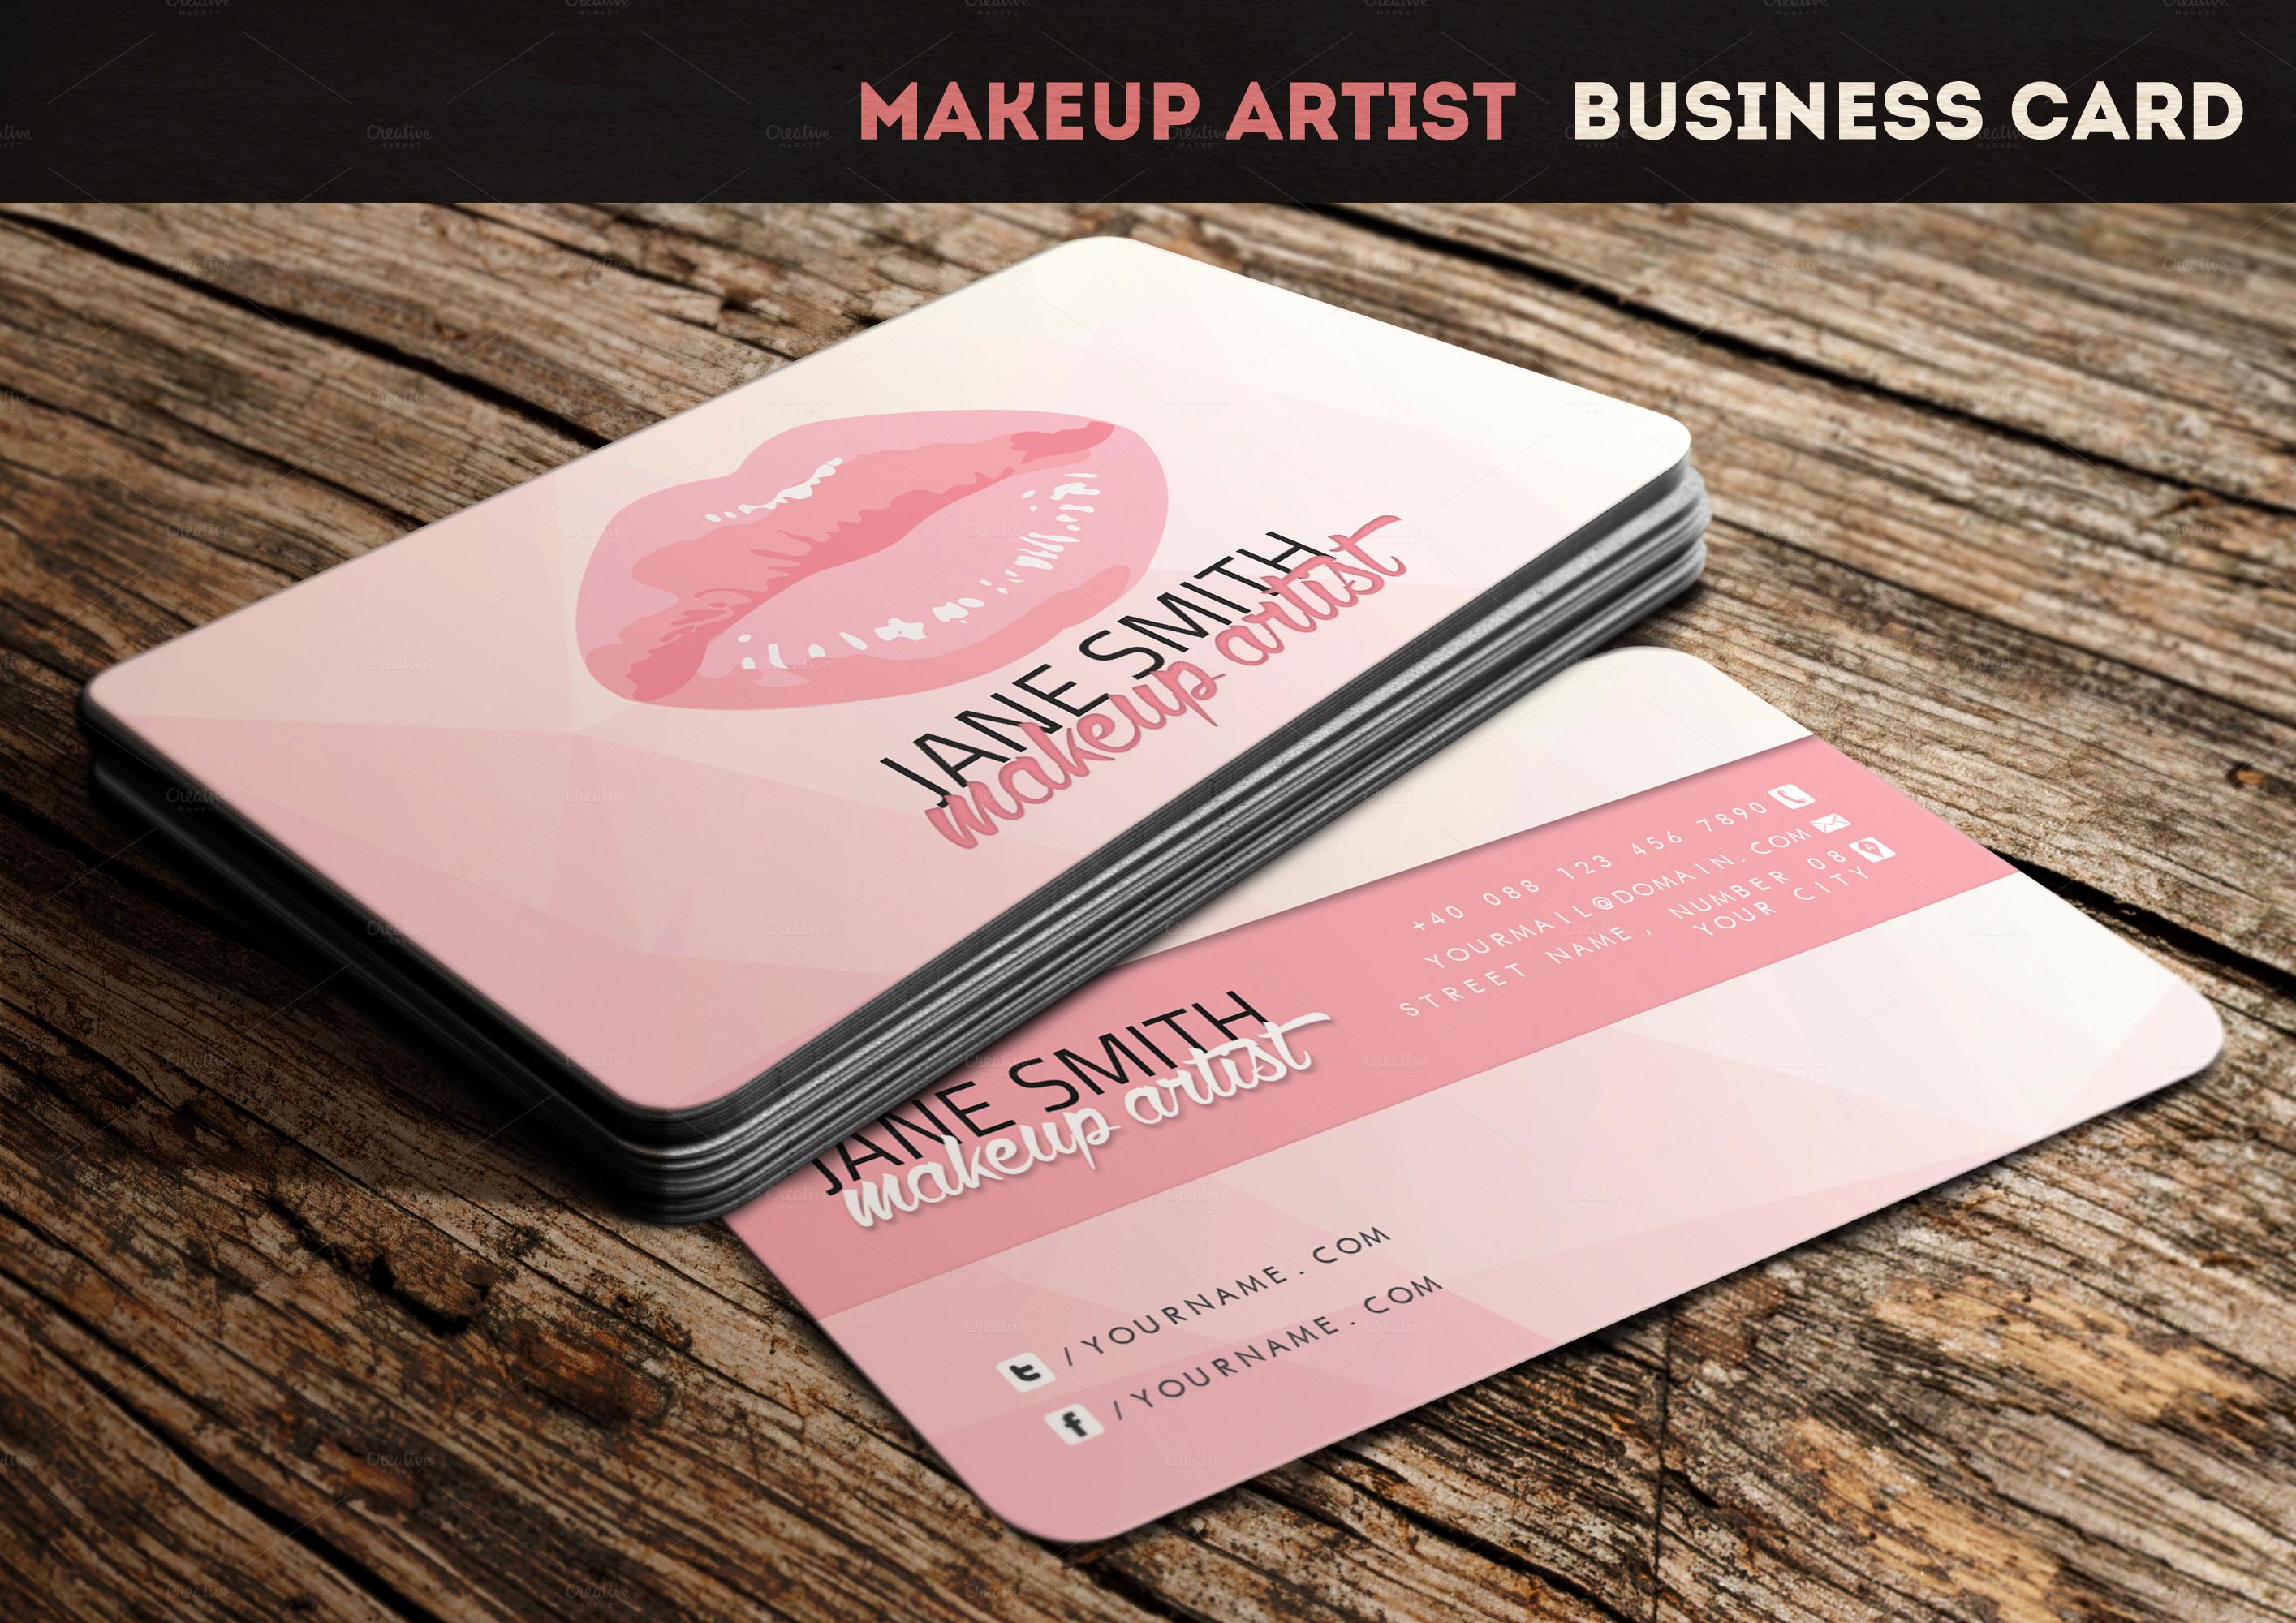 Business Cards for Artists Fresh Makeup Artist Business Card Business Card Templates On